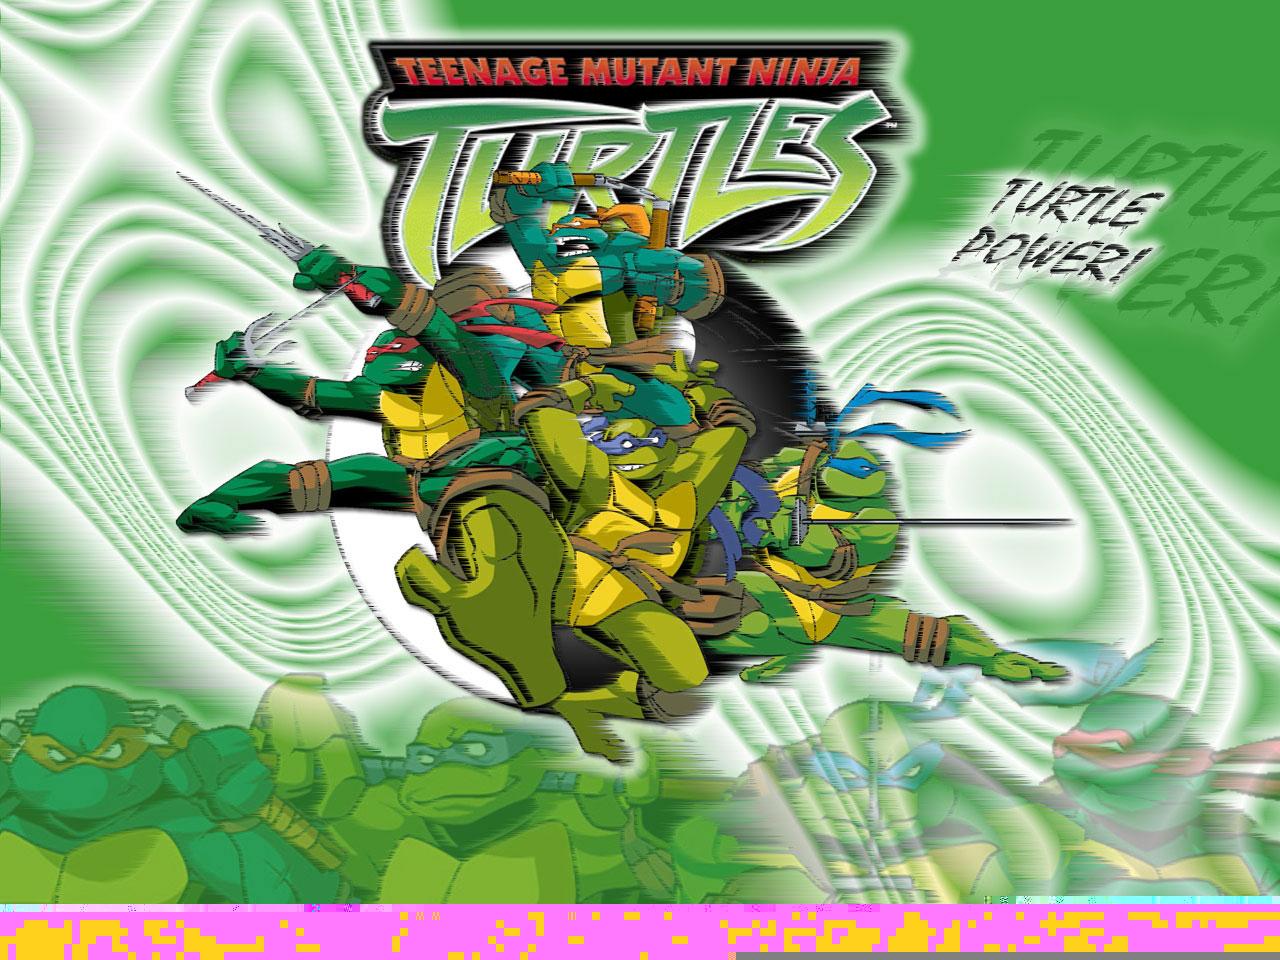 TMNT wallpaper 2003-2009 series (53)